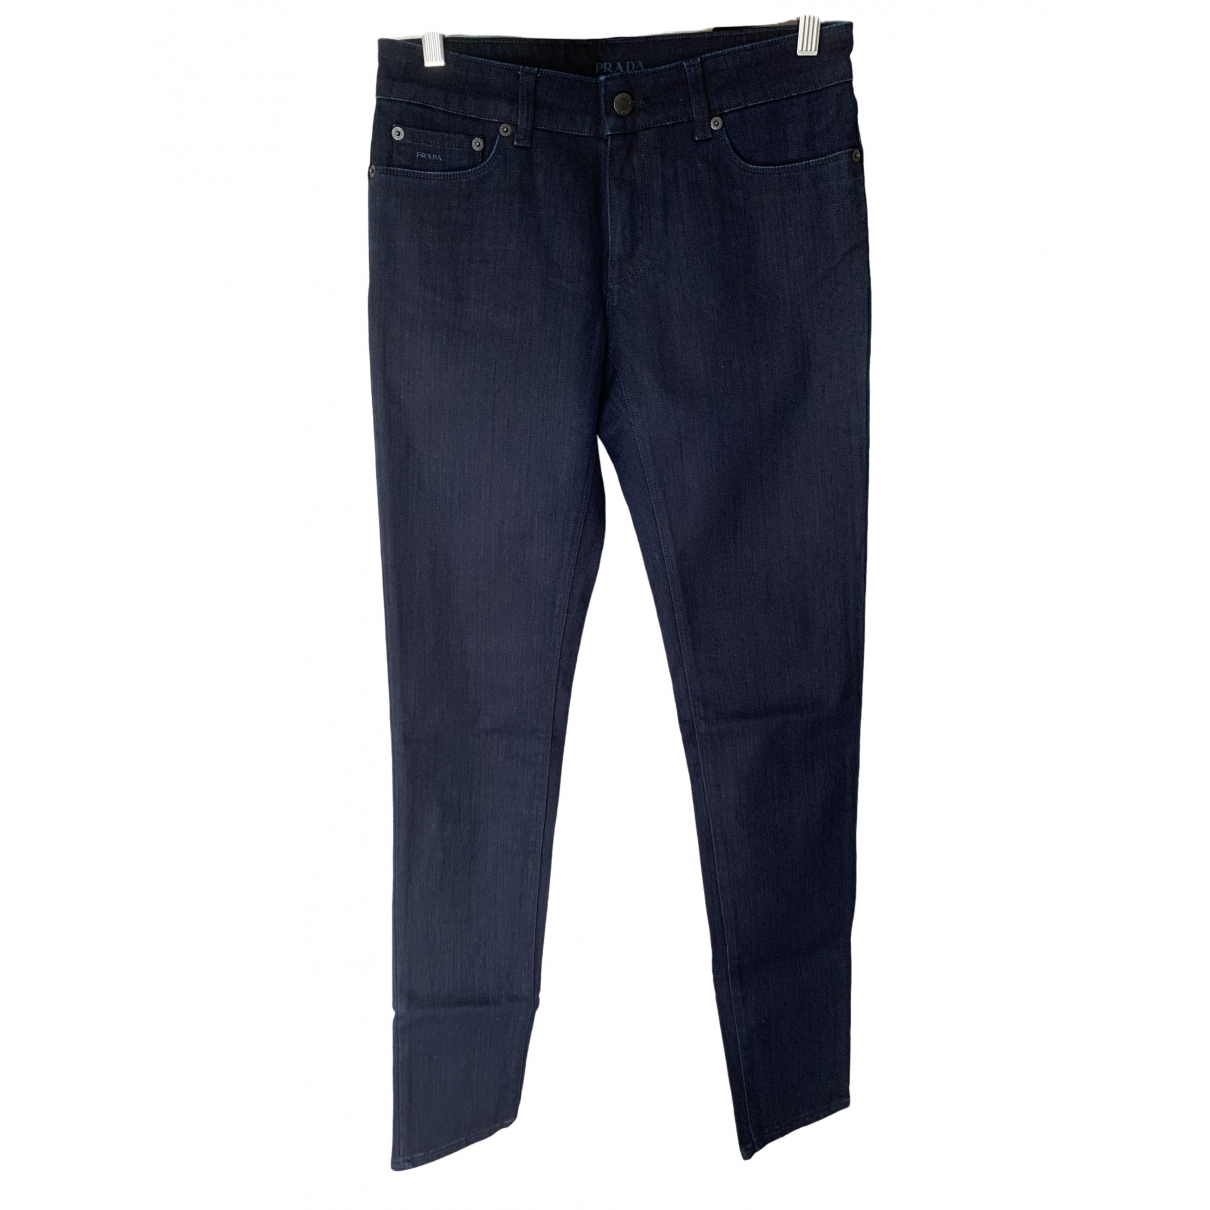 Prada \N Blue Cotton Jeans for Women 27 US